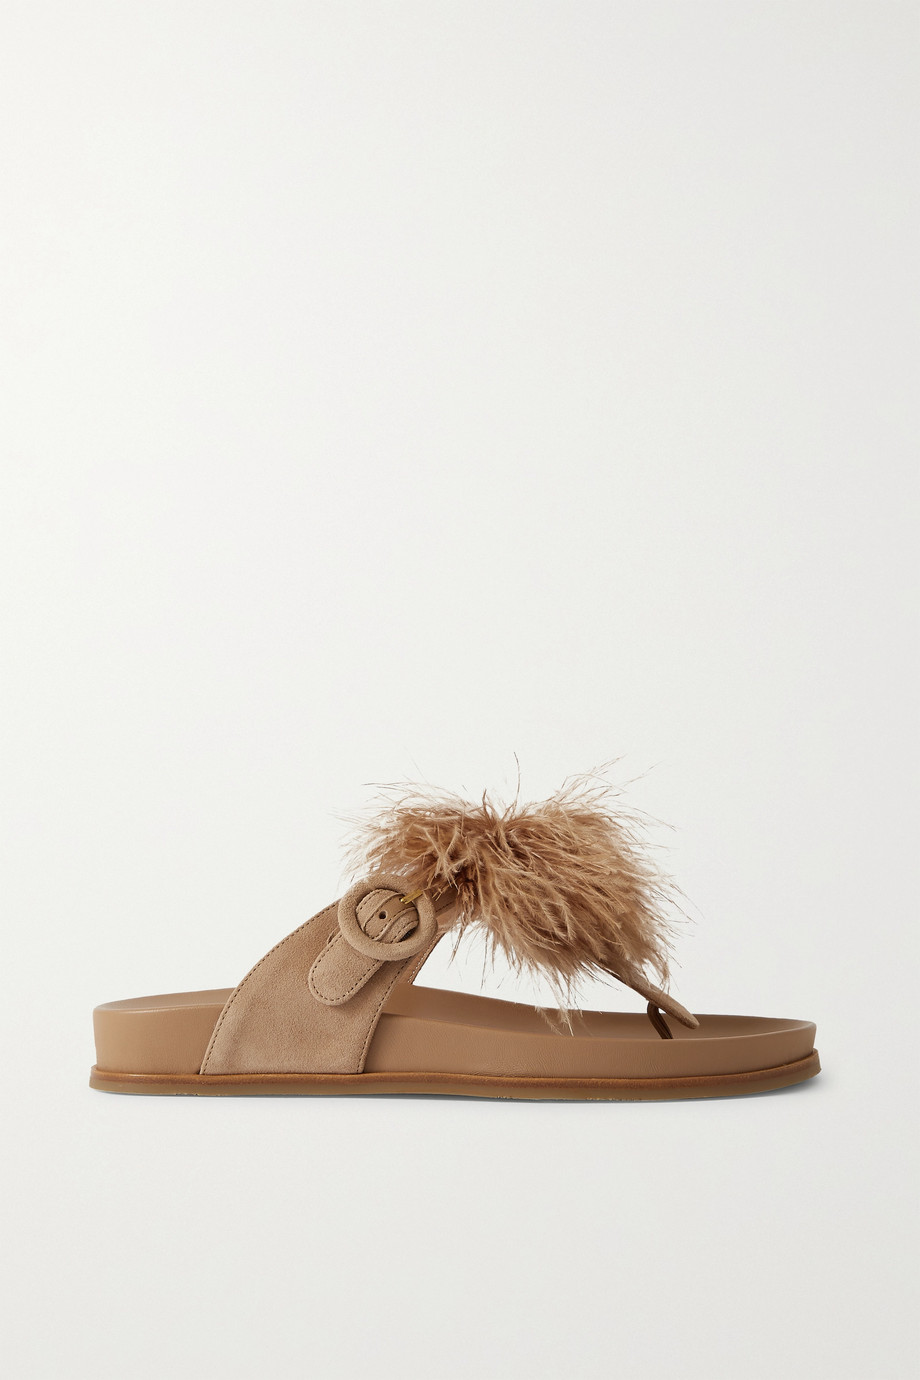 Aquazzura Boudoir Footbed feather-trimmed suede slides